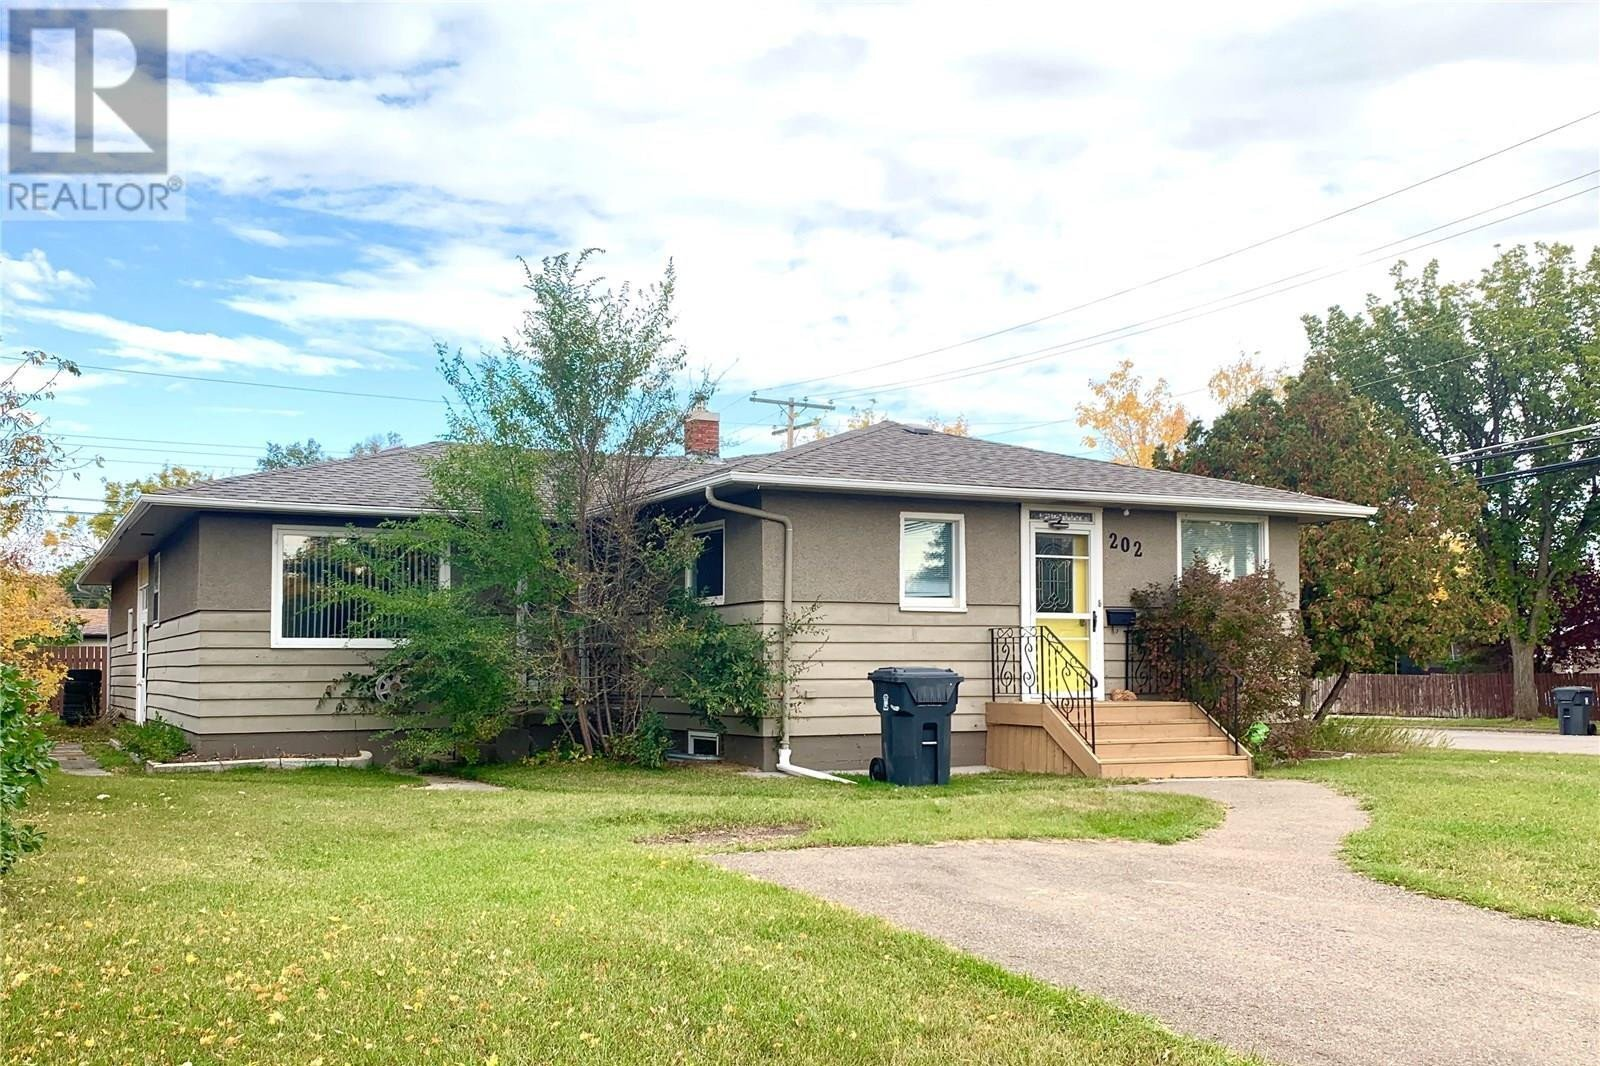 House for sale at 202 26th St Battleford Saskatchewan - MLS: SK819249